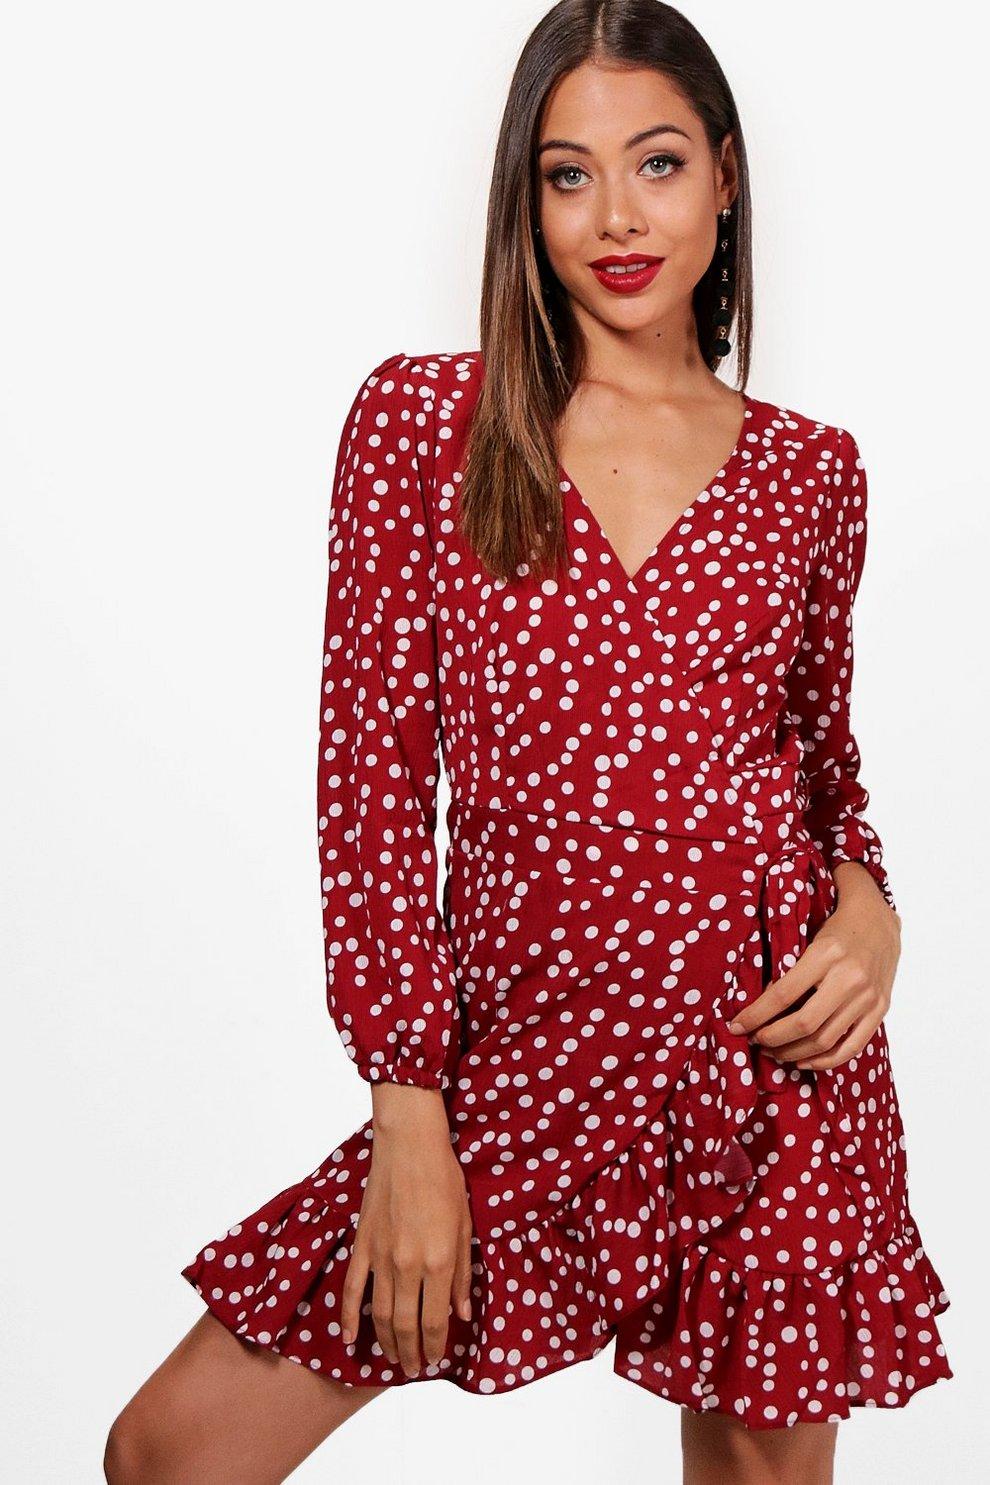 Boohoo Spot Print Ruffle Detail Wrap Tea Dress Buy Cheap Good Selling gtFNQ0